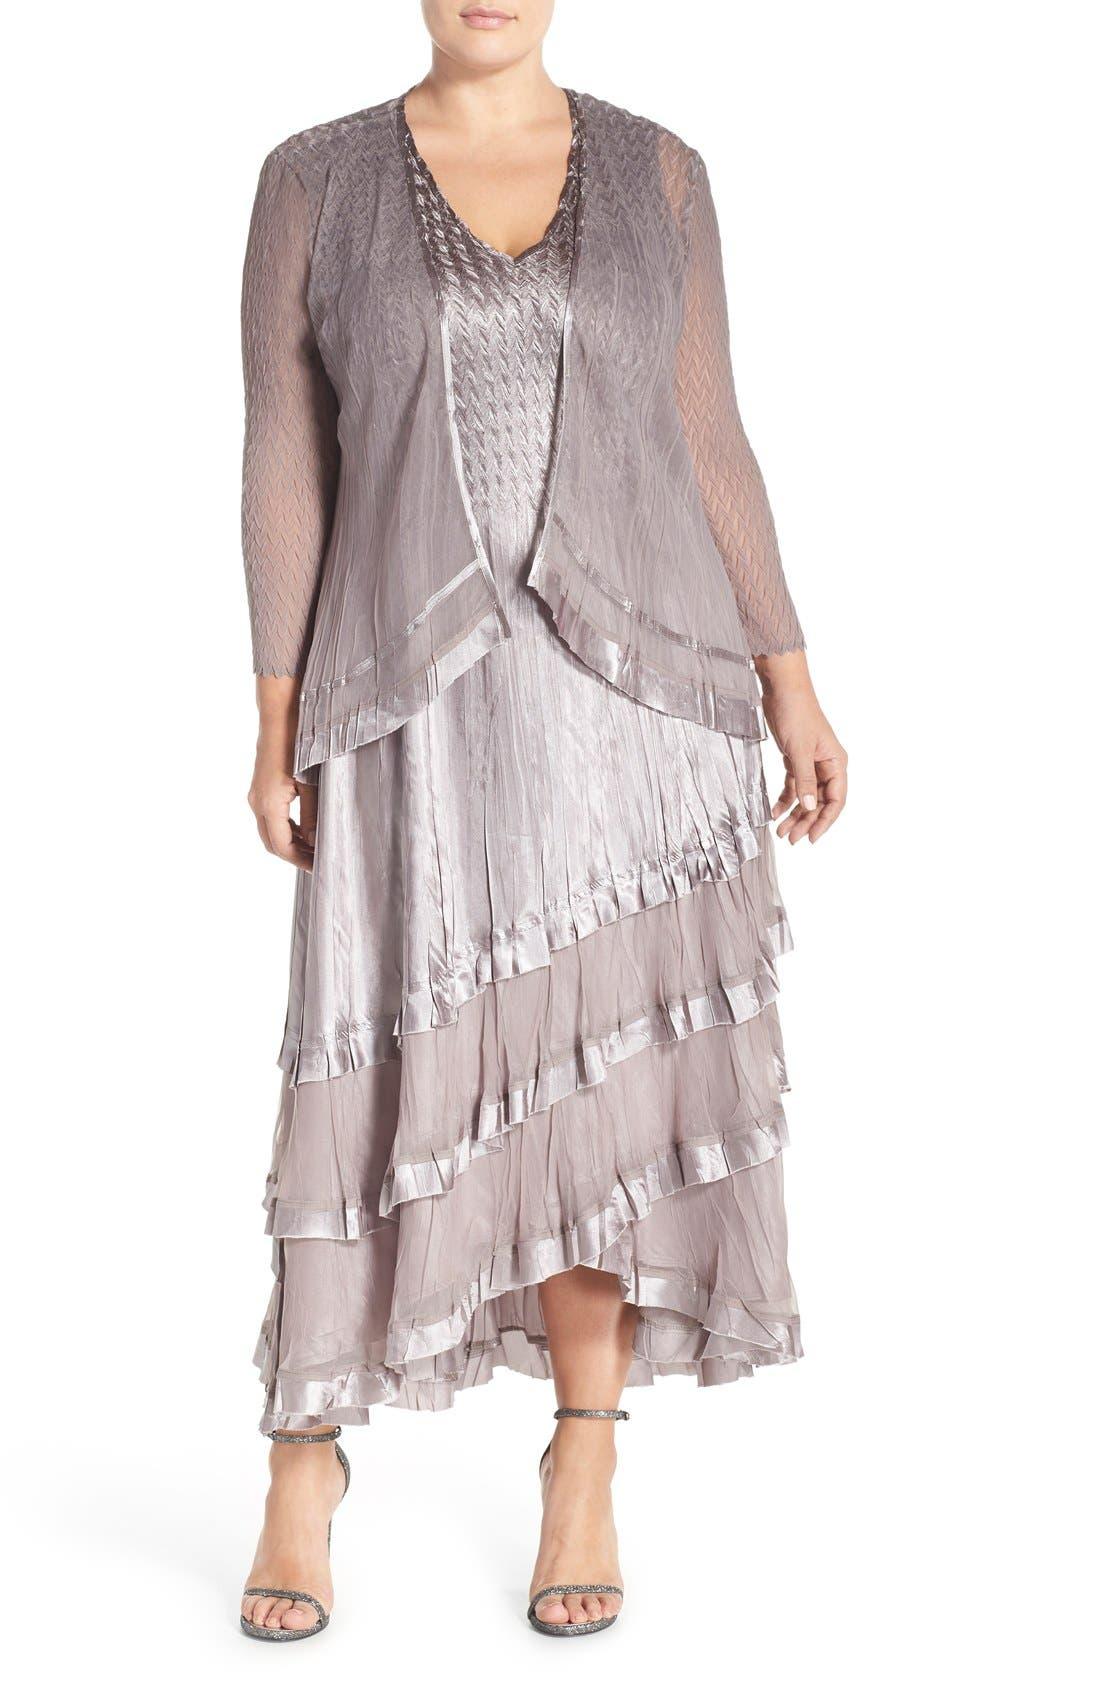 KOMAROV, Charmeuse Tiered Hem Dress with Chiffon Jacket, Main thumbnail 1, color, OYSTER SMOKE OMBRE